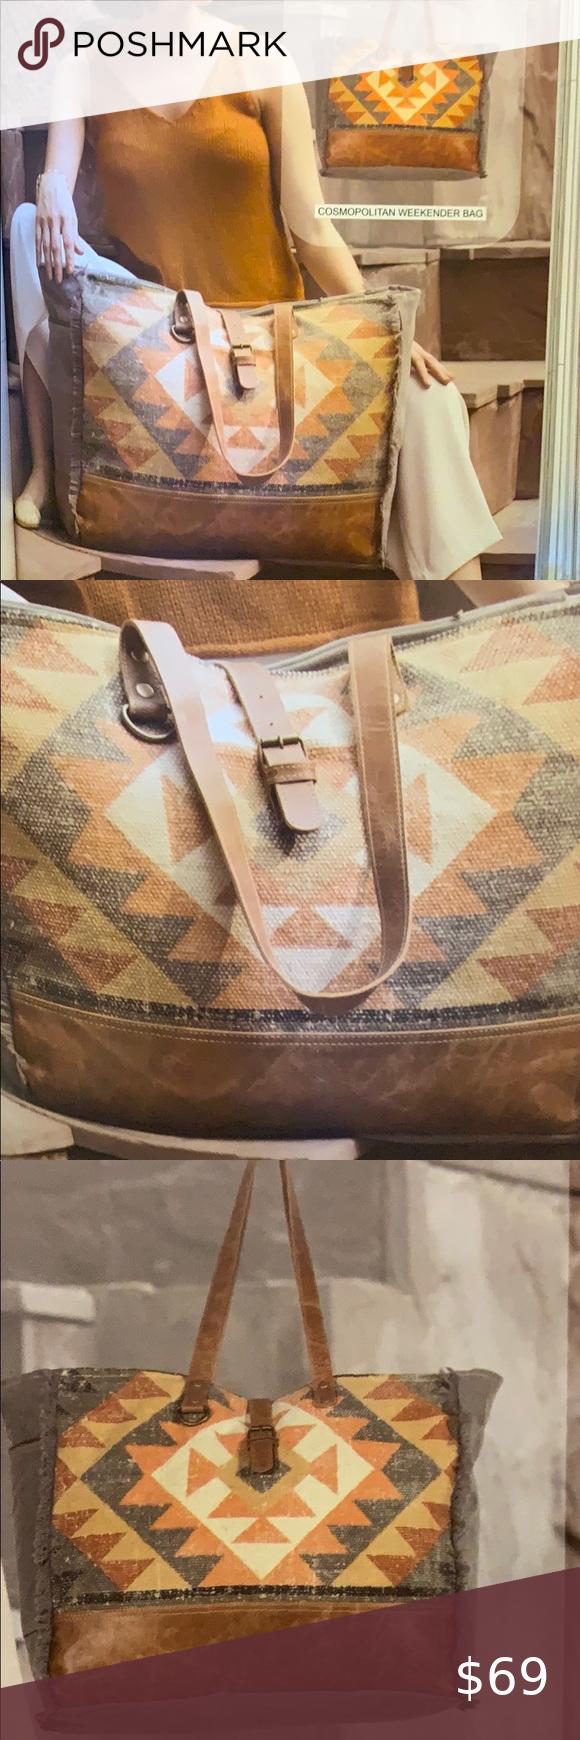 Myra Cosmopolitan Weekender Bag Canvas Leather In 2020 Weekend Travel Bags Weekender Bag Overnight Travel Bag Get the lowest price on your favorite brands at poshmark. pinterest